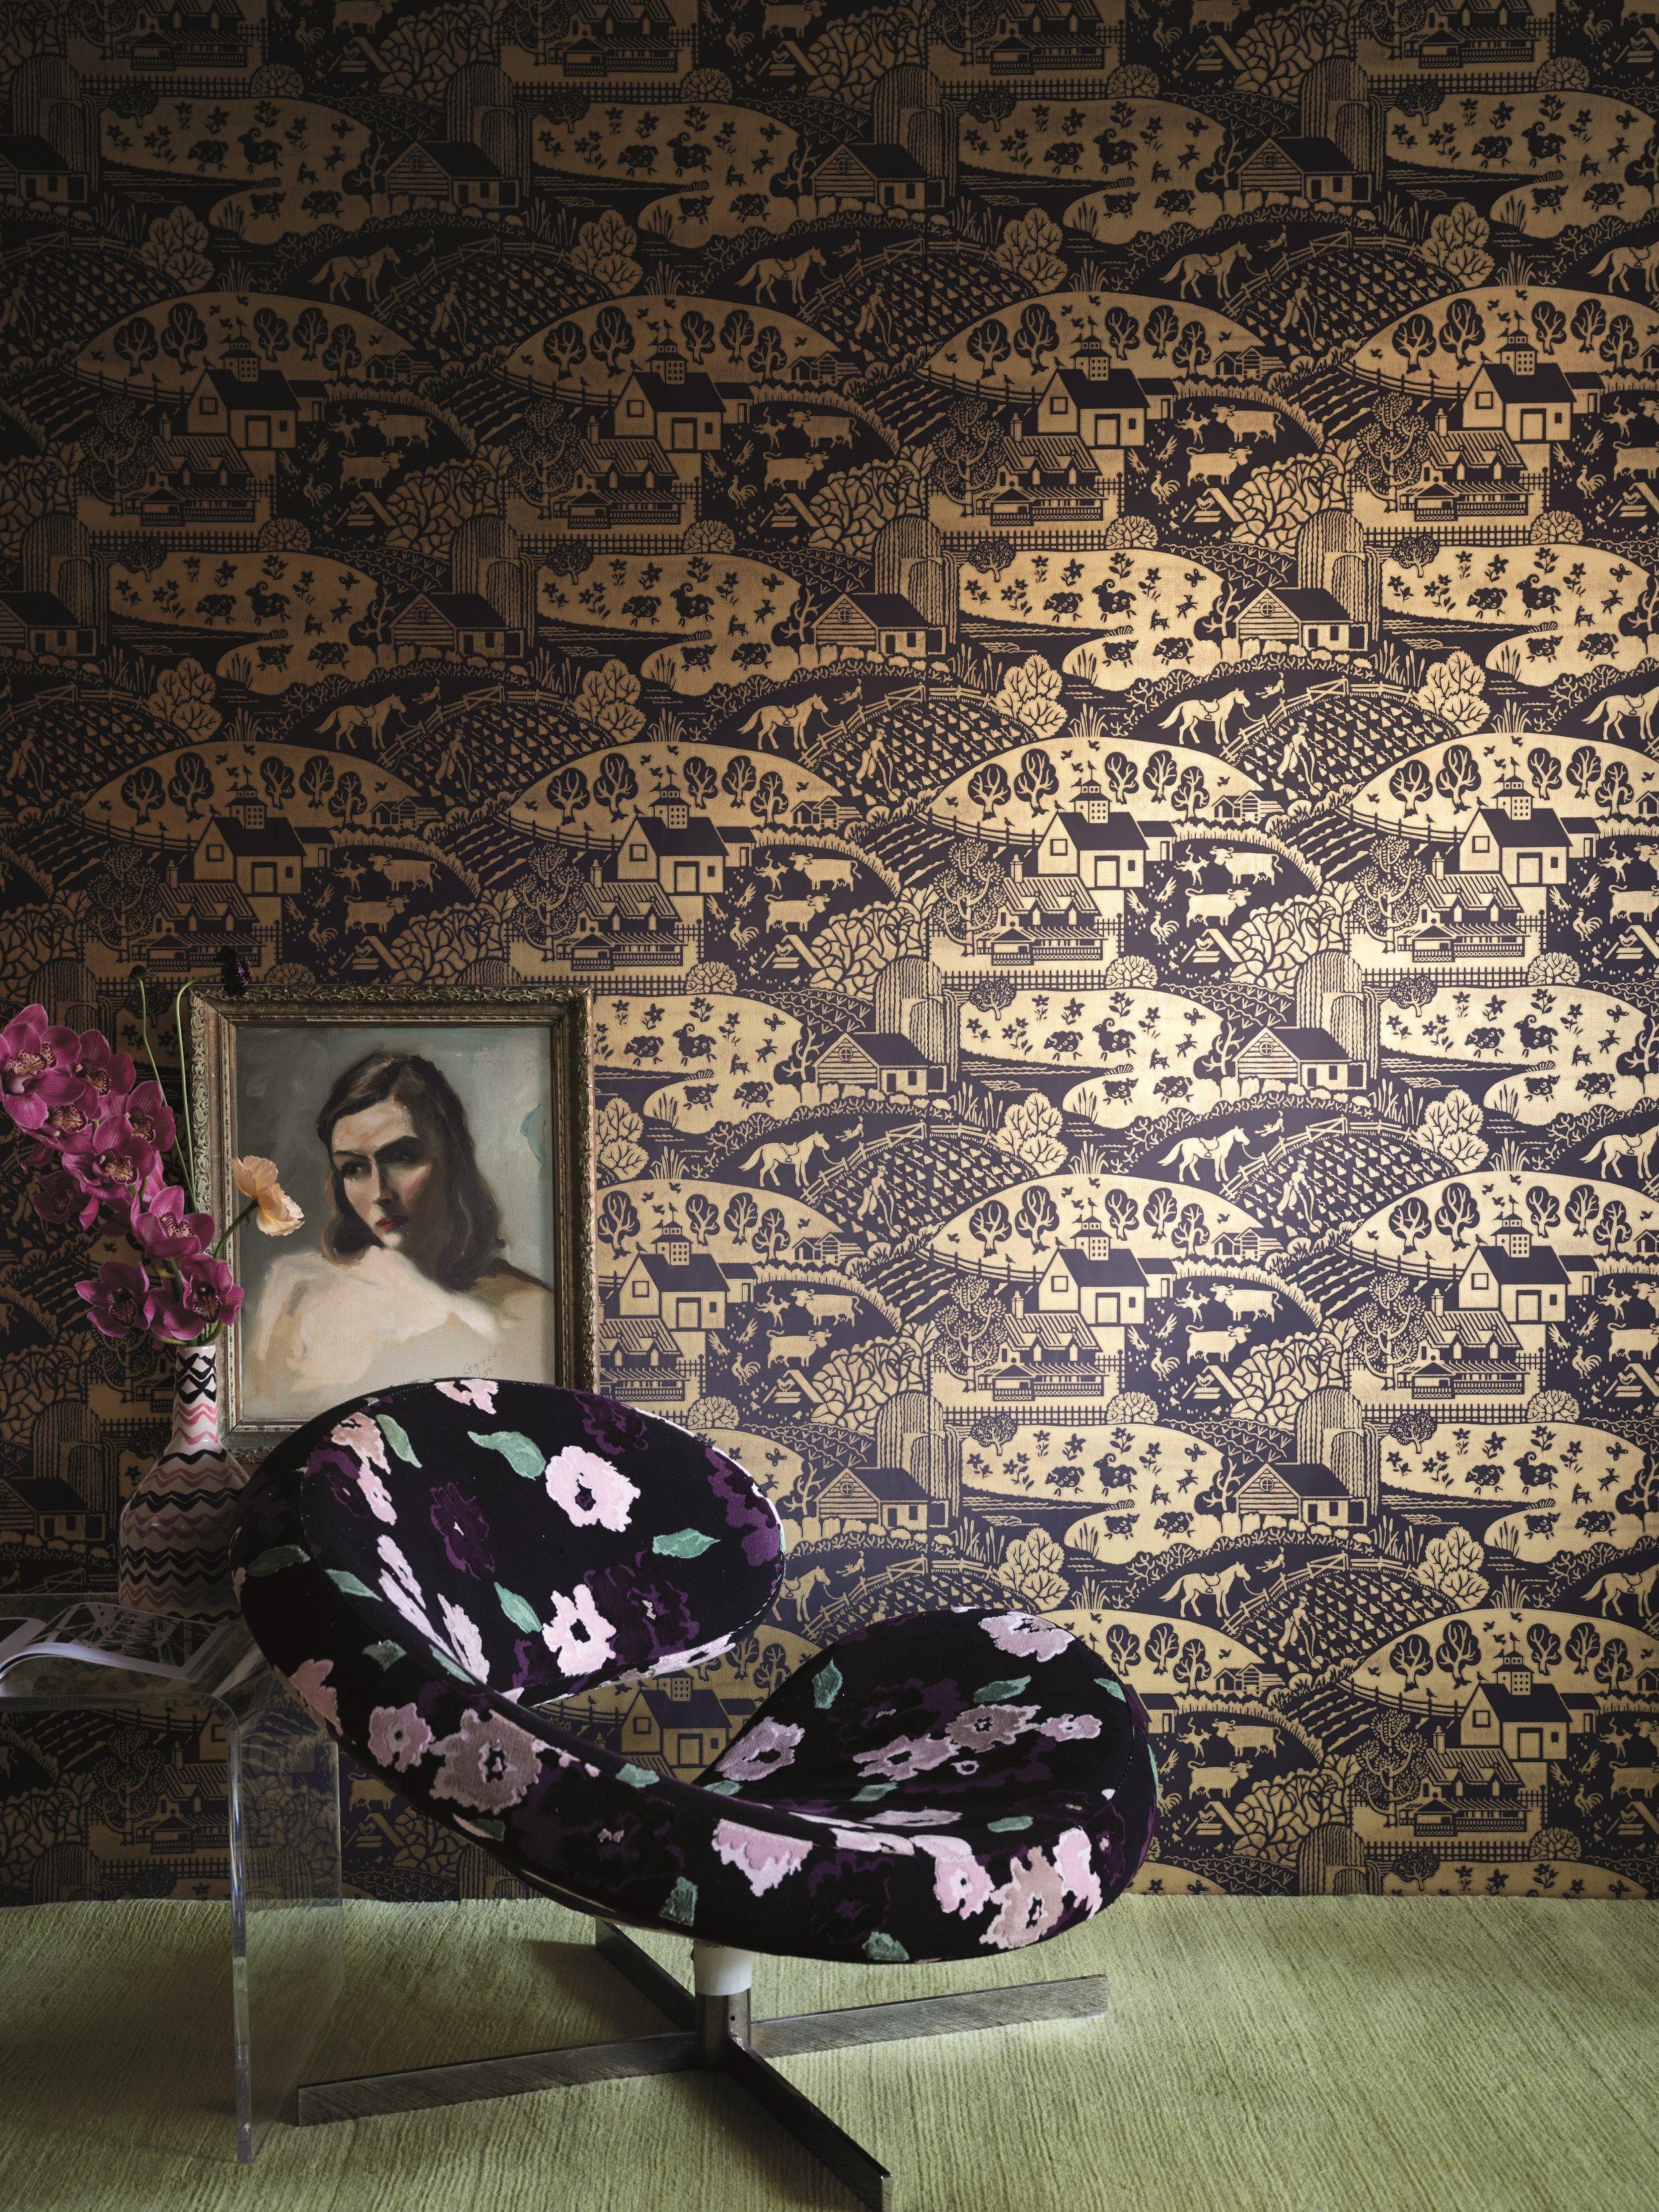 Wallpaper Shown : Gable 5409